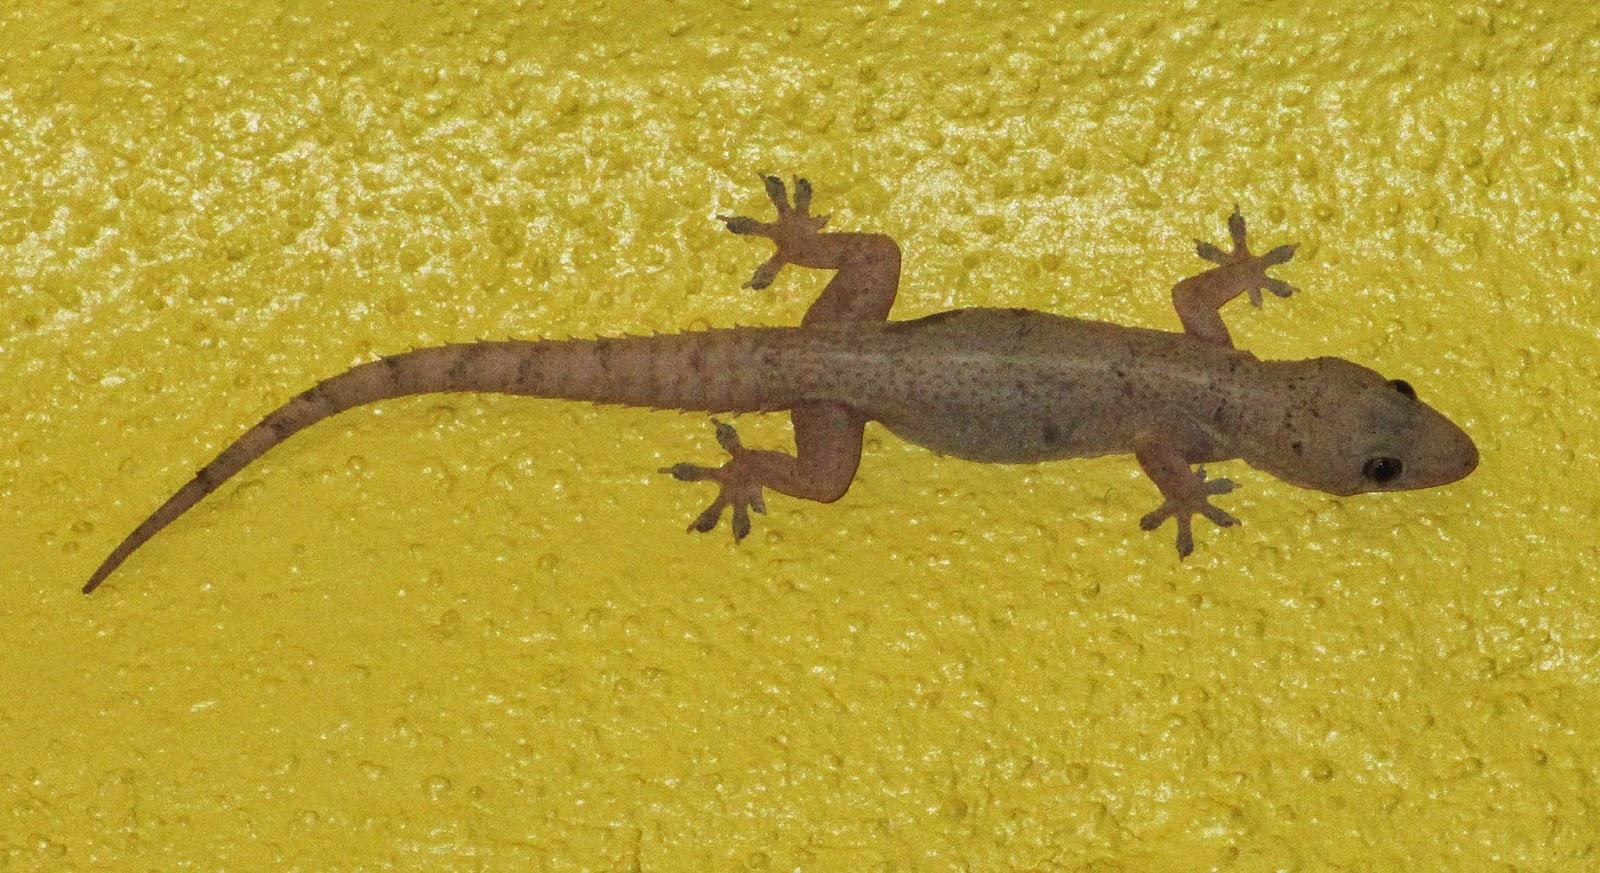 cannundrums: tropical house gecko